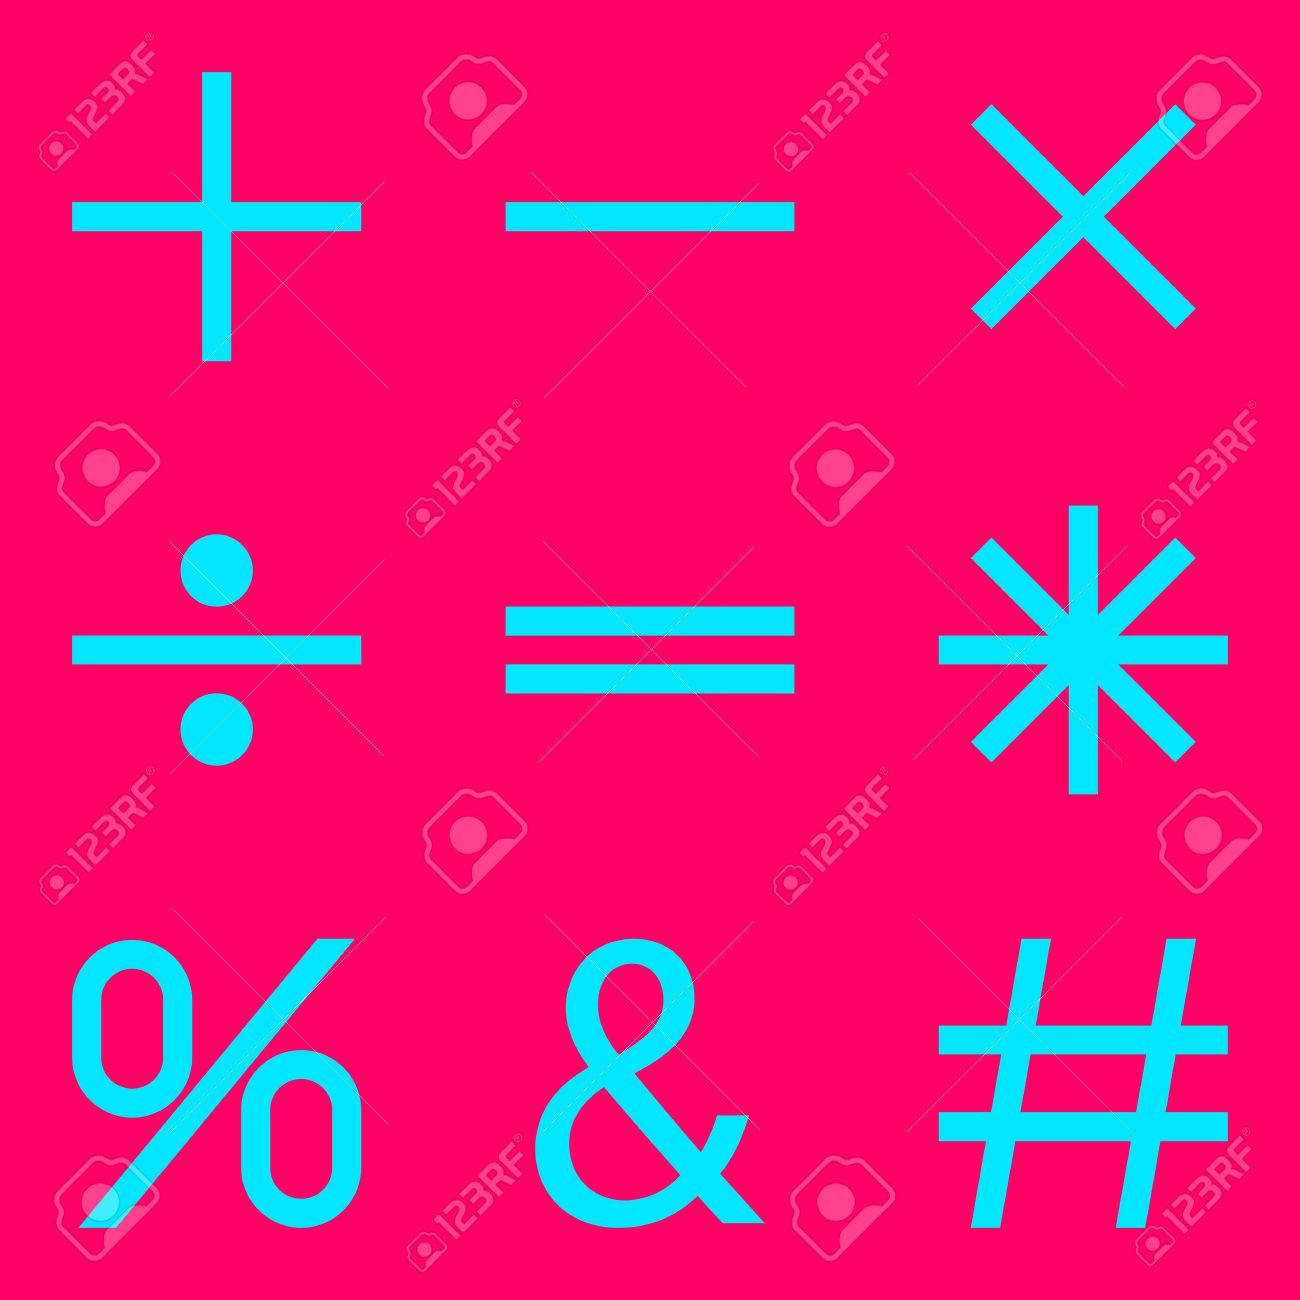 Basic Mathematical Symbols On Pink Background Vector Illustration